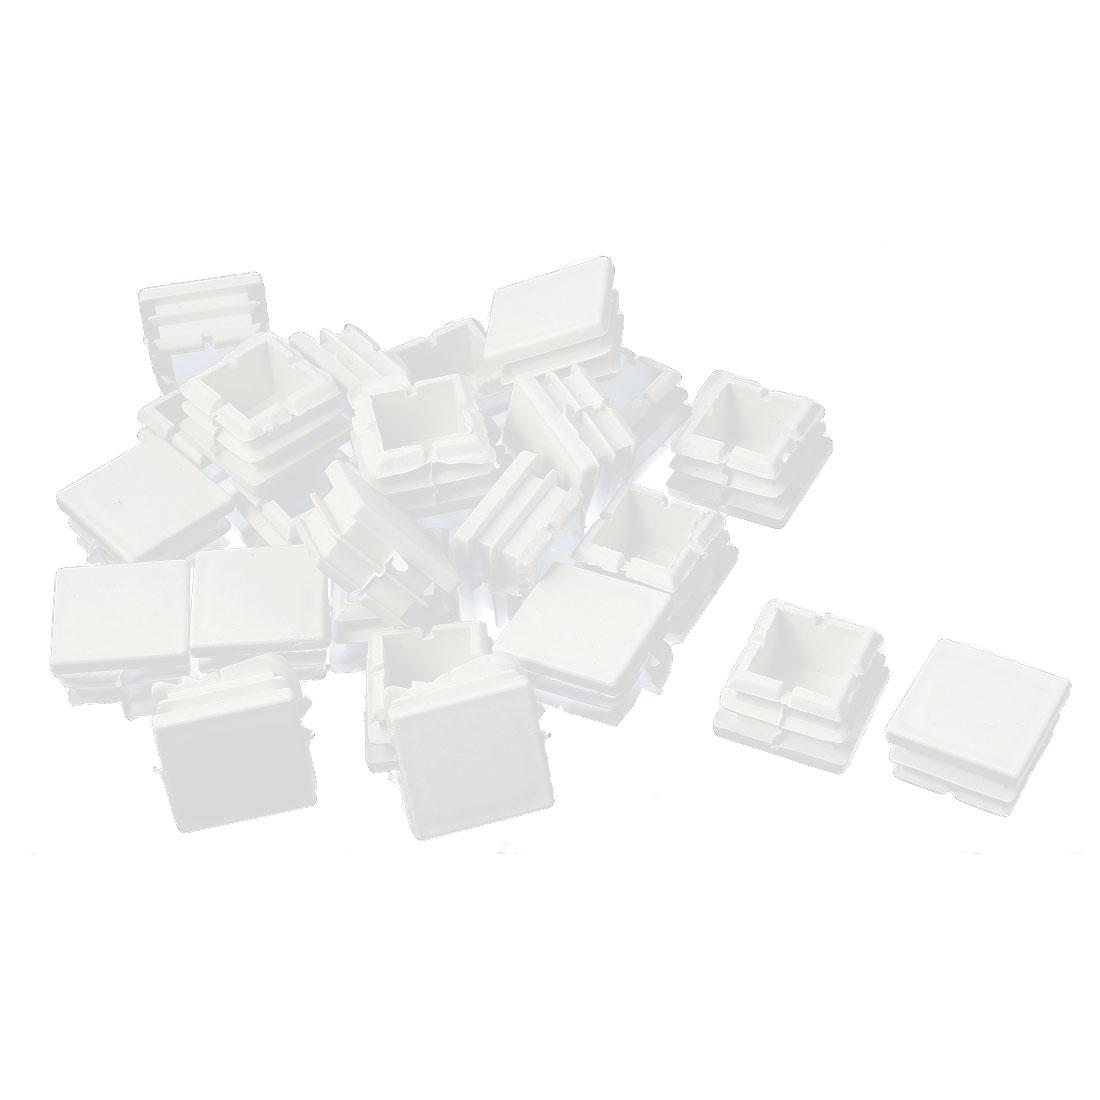 Home Flat Base Protect Square Tube Pipe Inserts Caps White 25mm x 25mm 25 Pcs